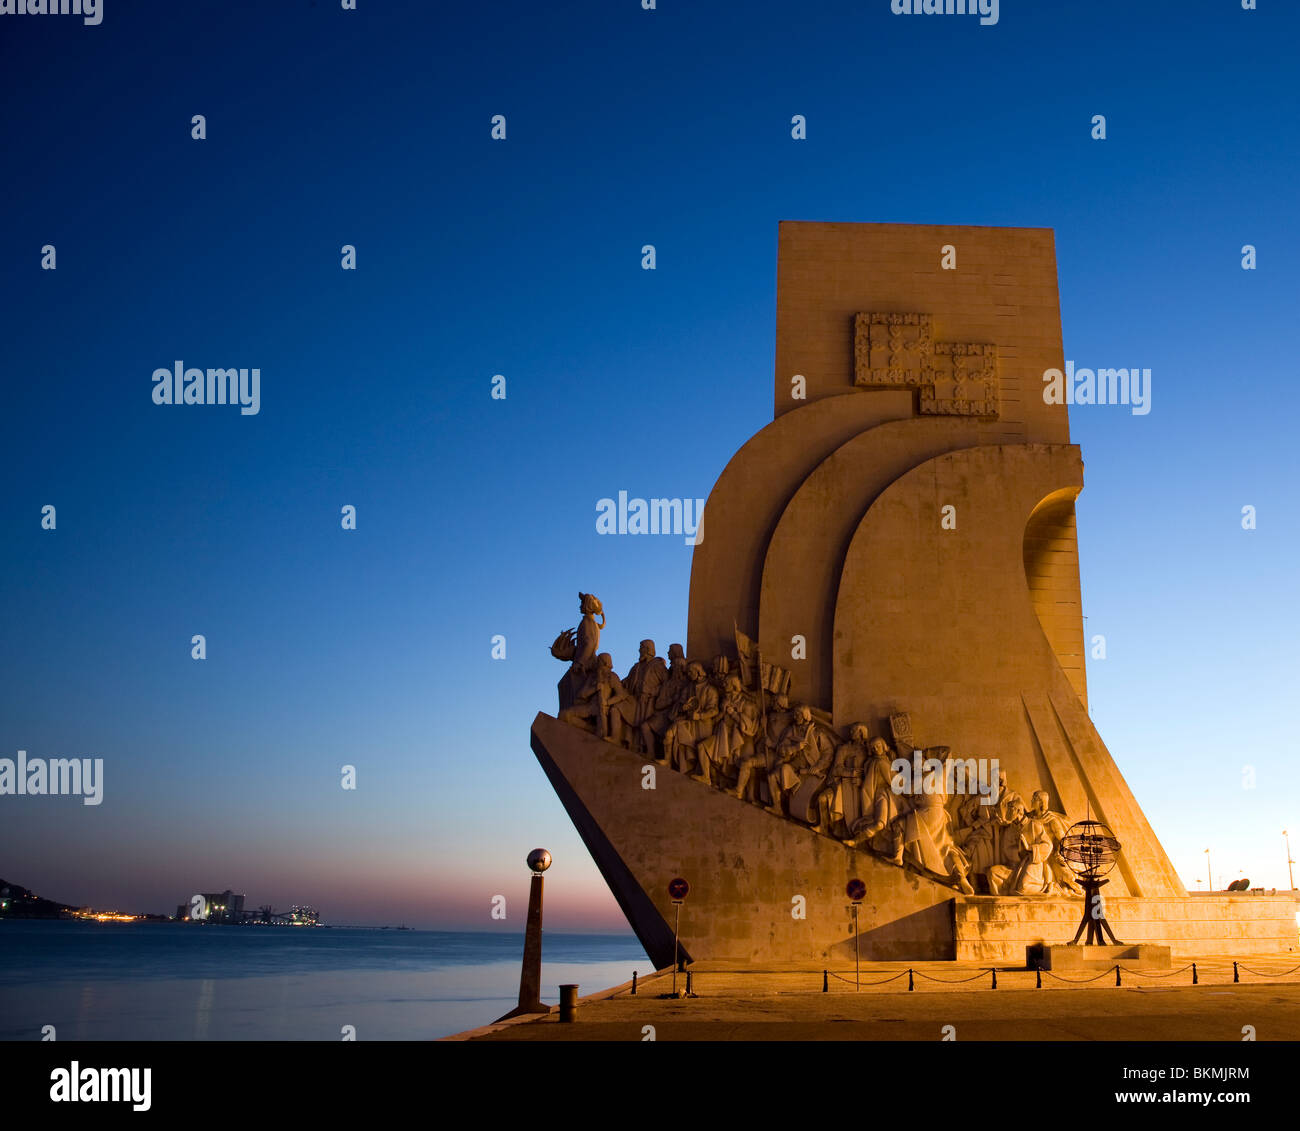 Denkmal der Entdeckungen in der Dämmerung, Lissabon, Portugal Stockbild